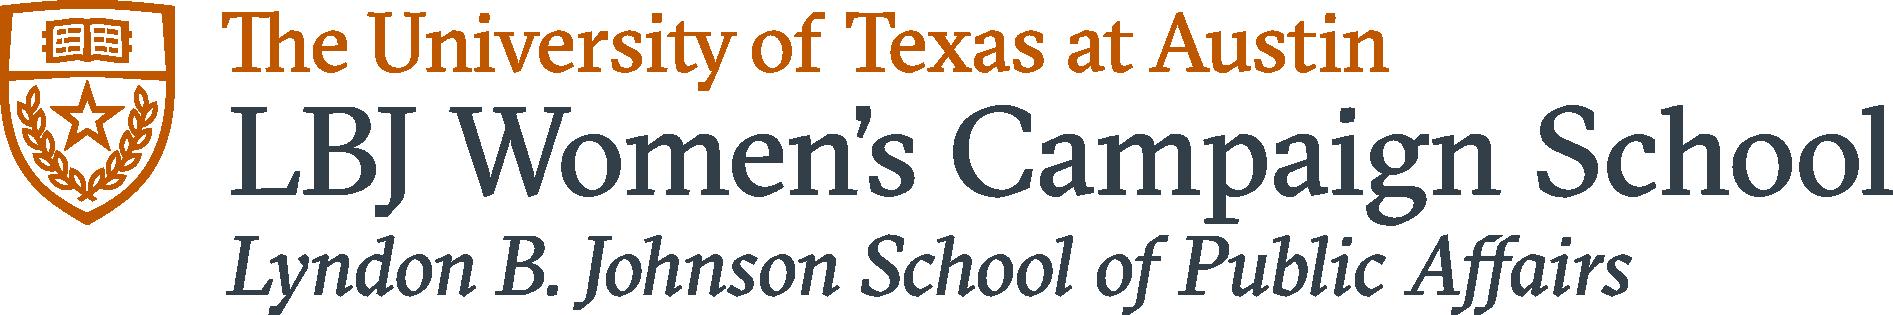 LBJ Women's Campaign School logo